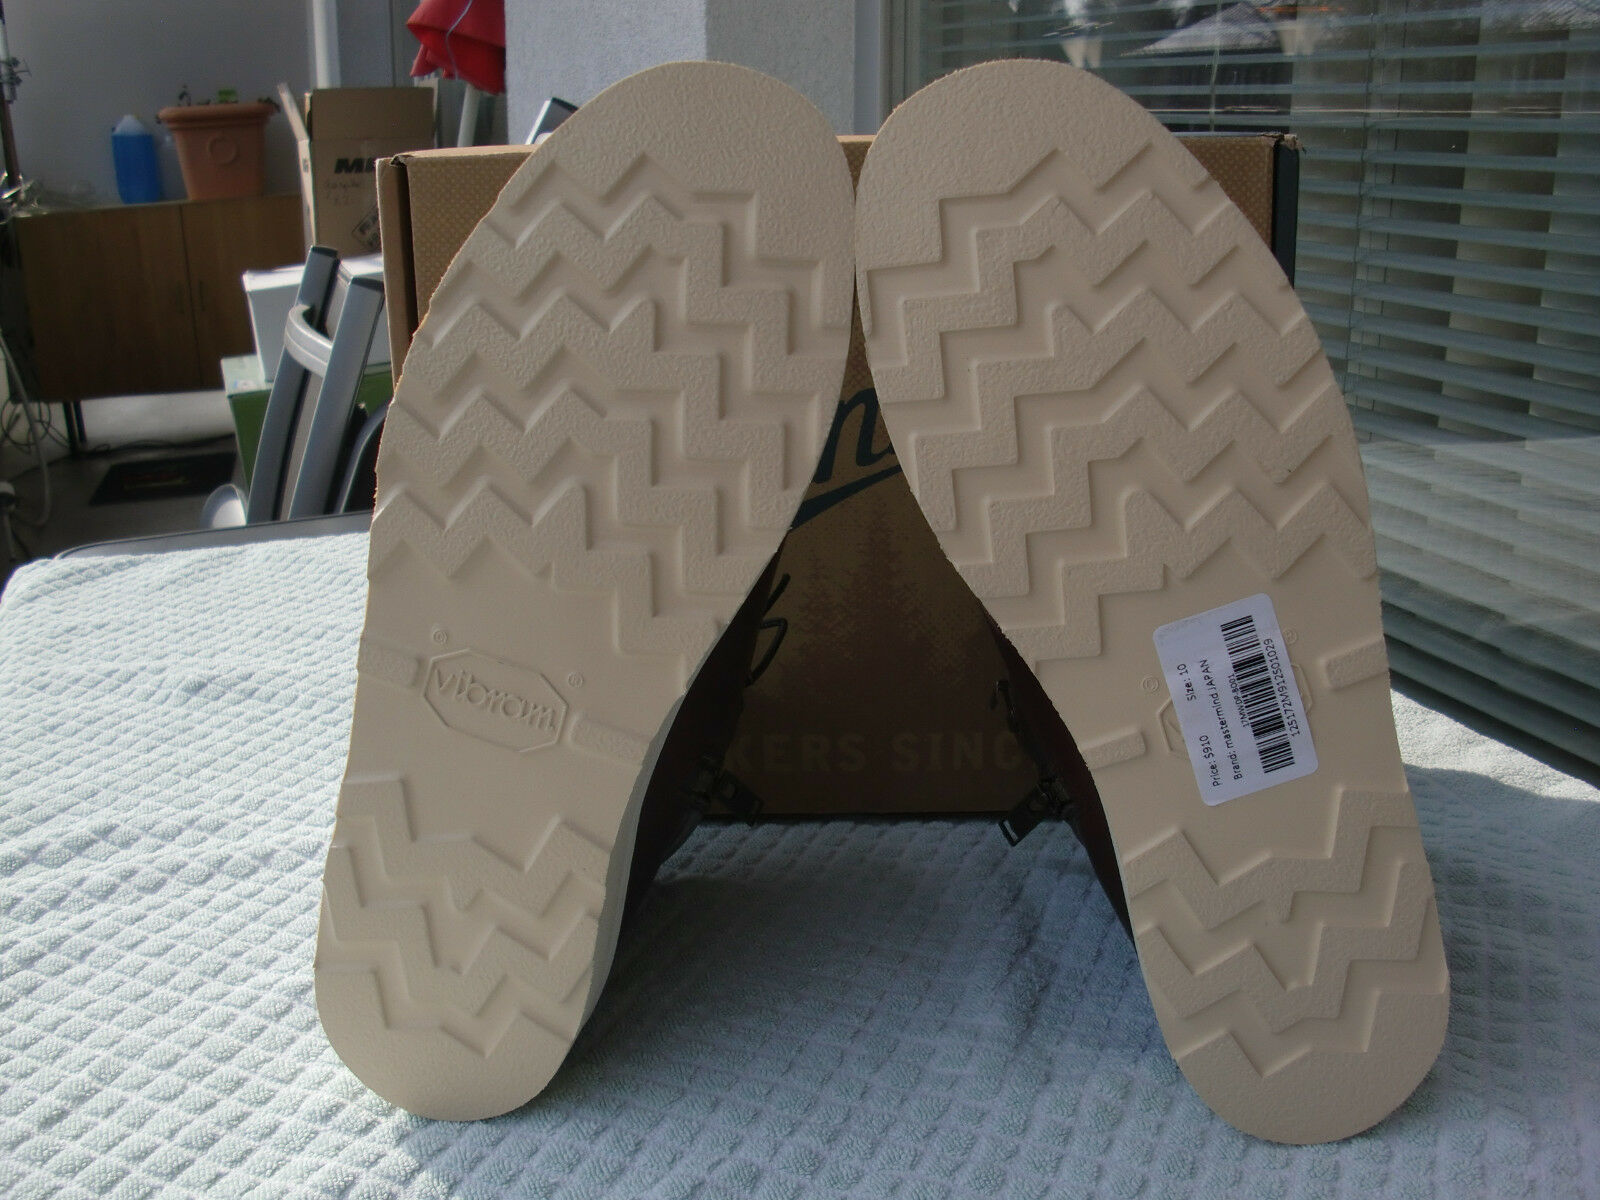 MASTERMIND WORLD Japan x DANNER, handmade, handmade, handmade, VIBRAM sole, very limited, luxury, DS    7434f9